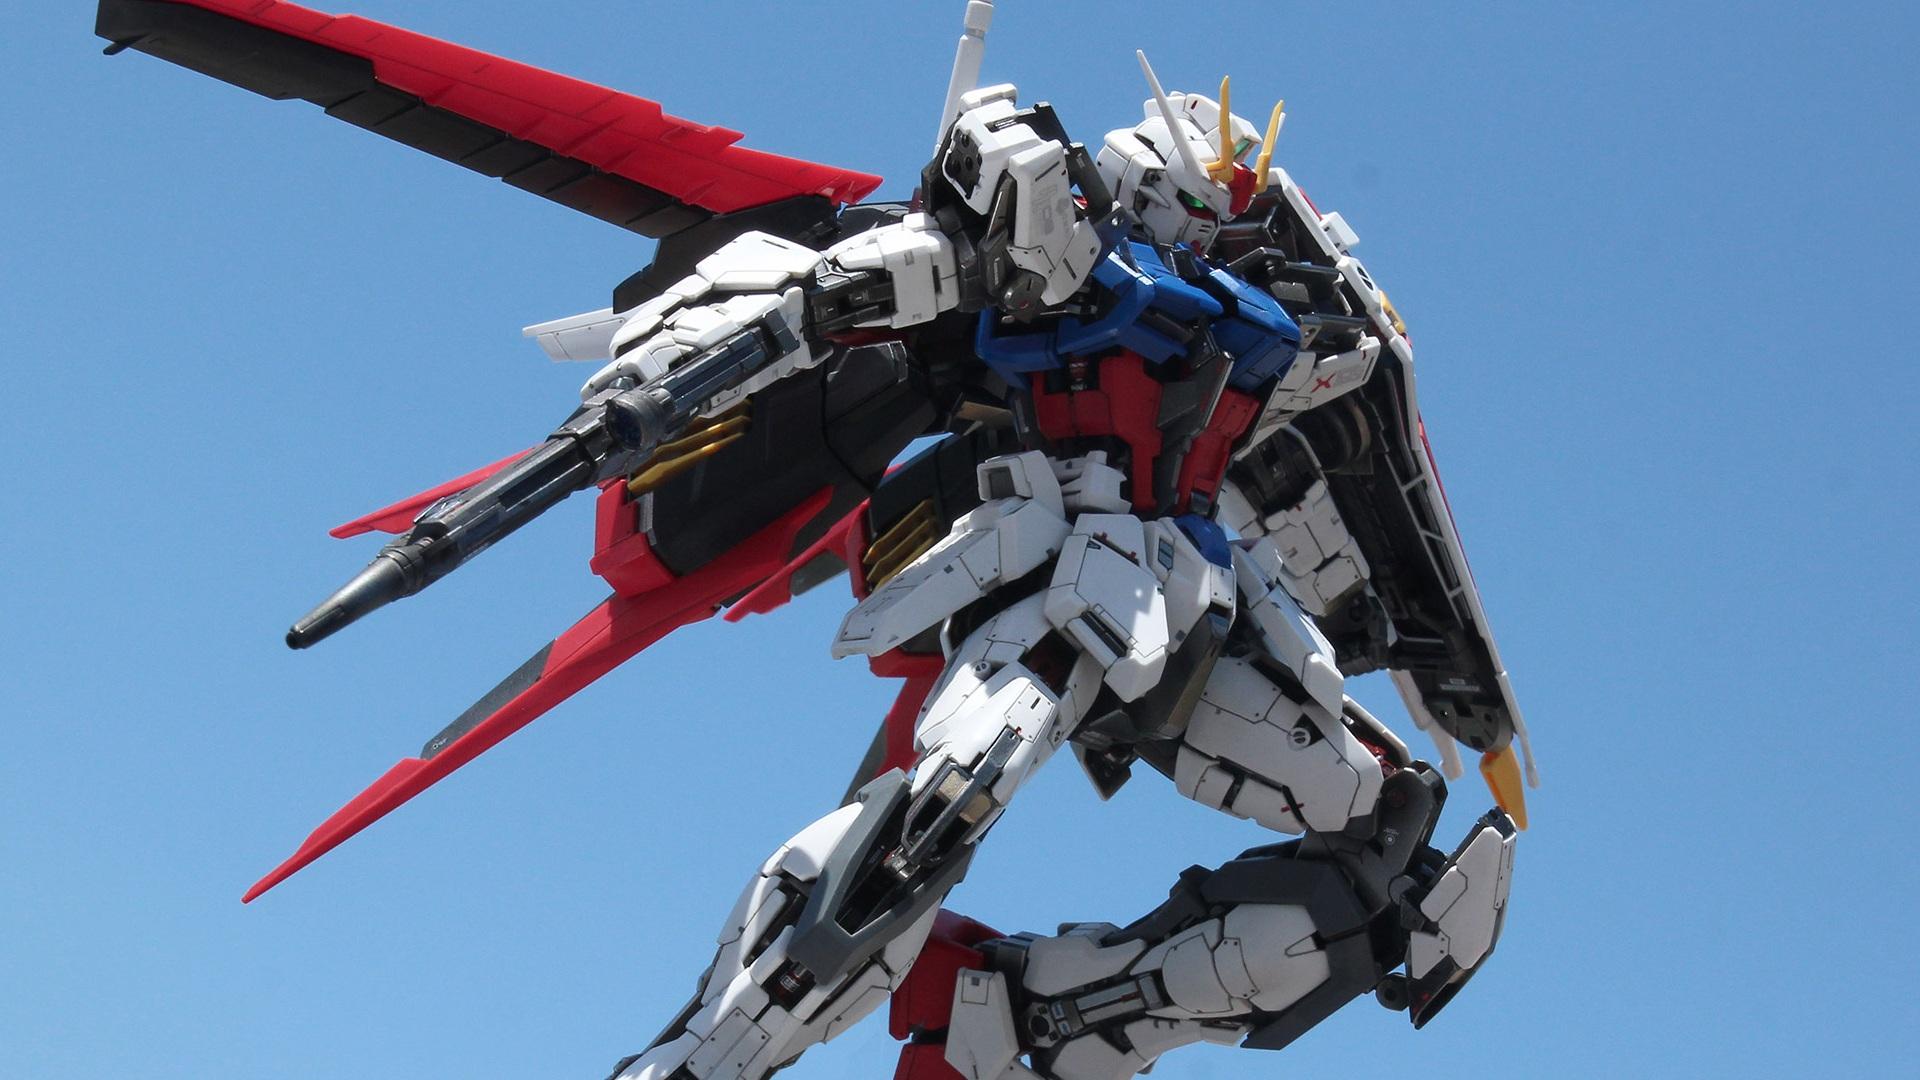 Wallpaper Gundam Aile Strike Gunpla Josh Darrah